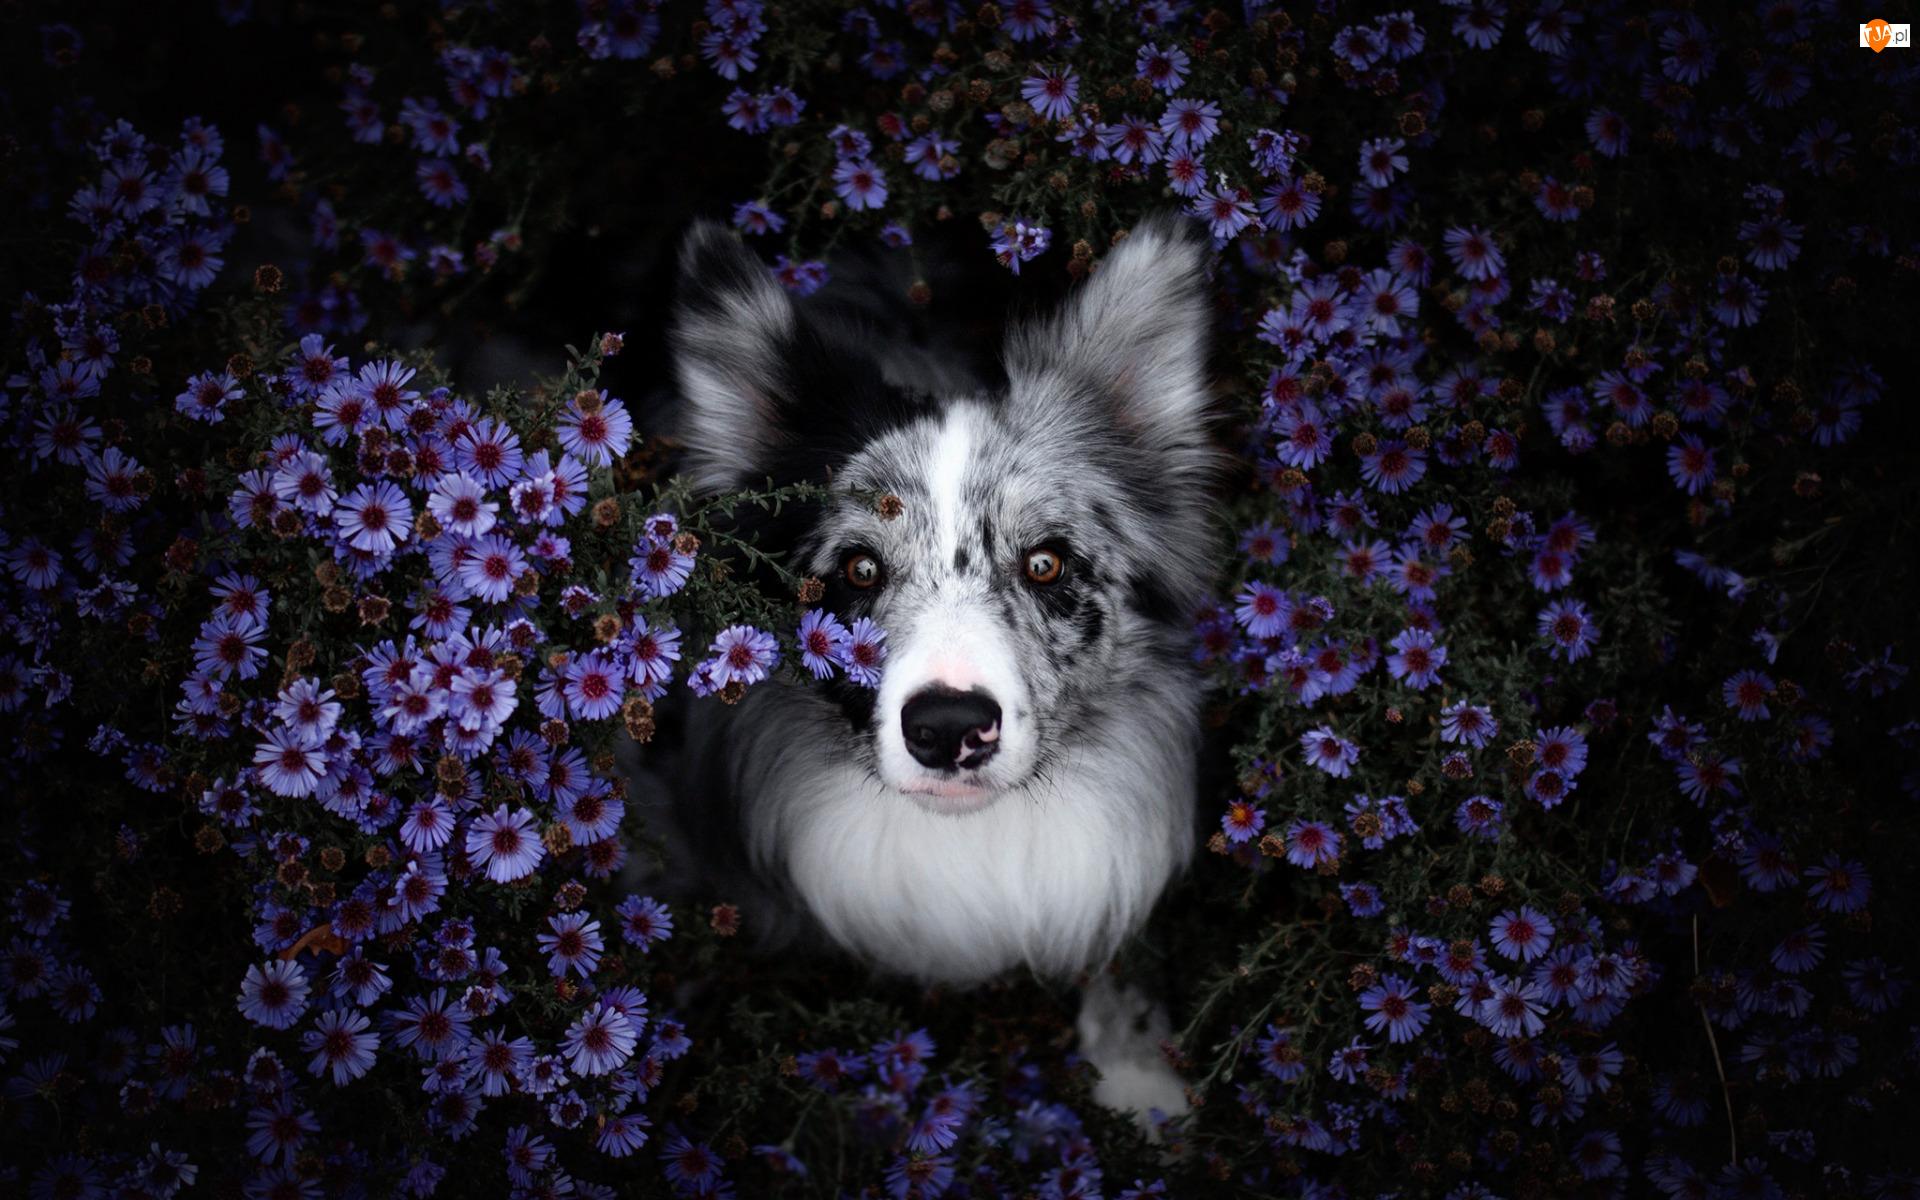 Astry marcinki, Pies, Border collie, Kwiaty